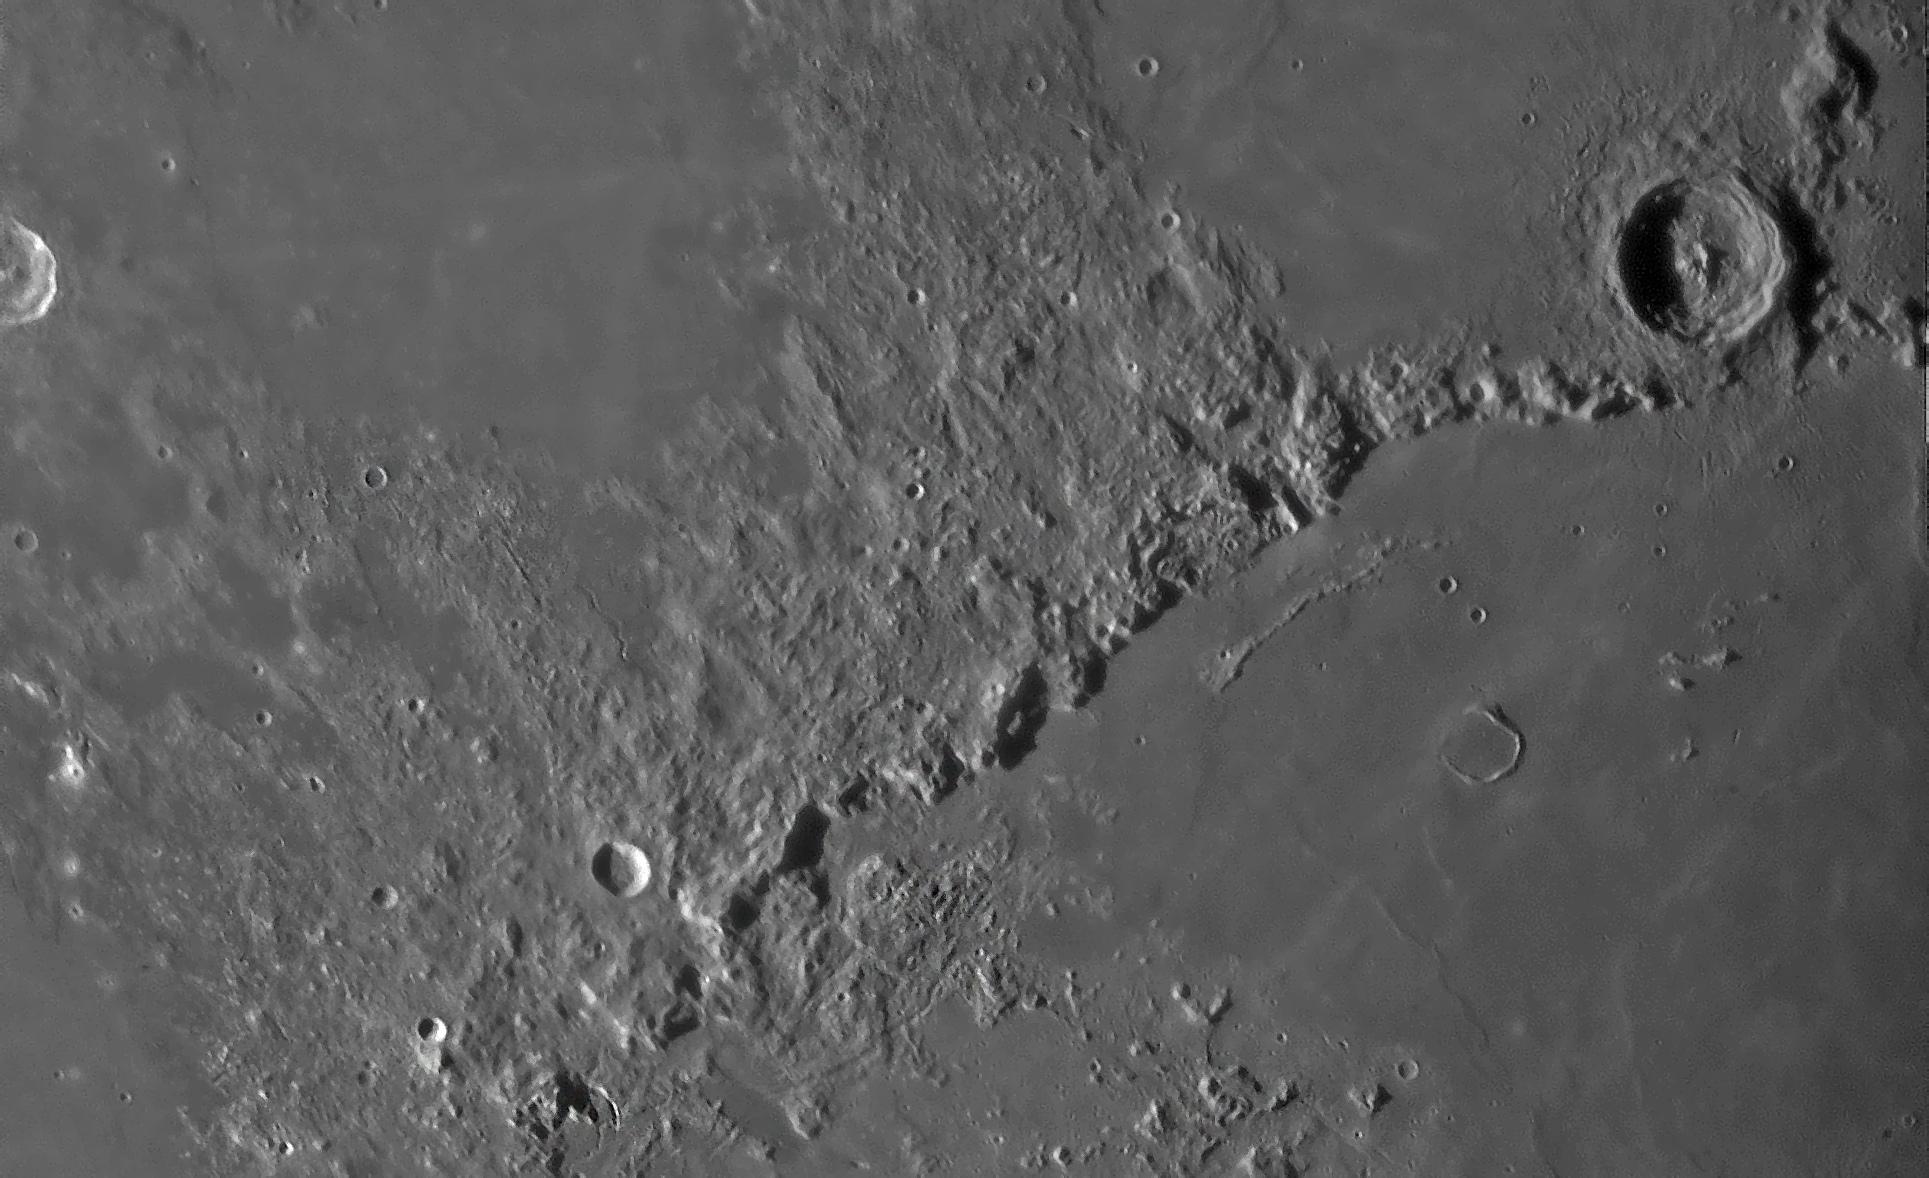 lune27nov4.jpg